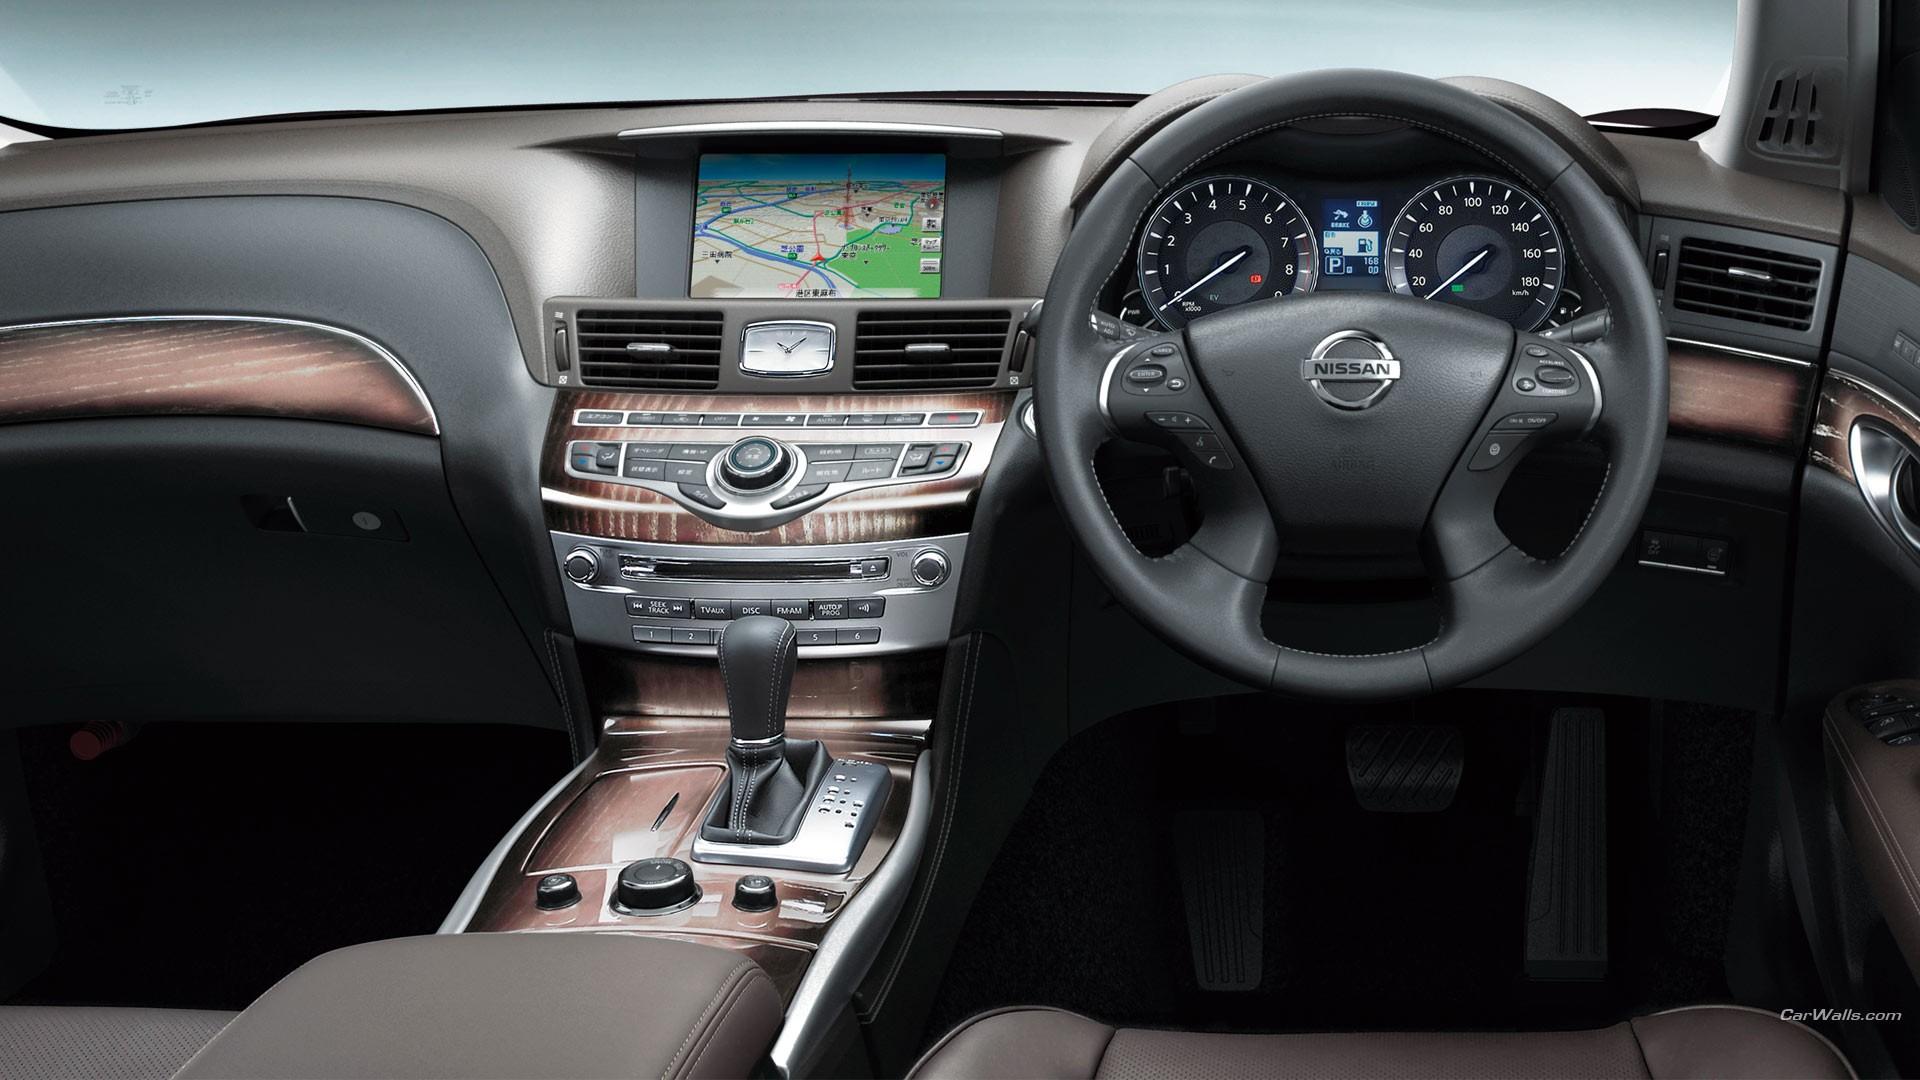 Papel De Parede : Interior Do Carro, Mercedes Benz, Mercedes Benz Classe E,  Infinito, Nissan Cima, Infiniti Q70, Veículo Terrestre, Automóvel, ...